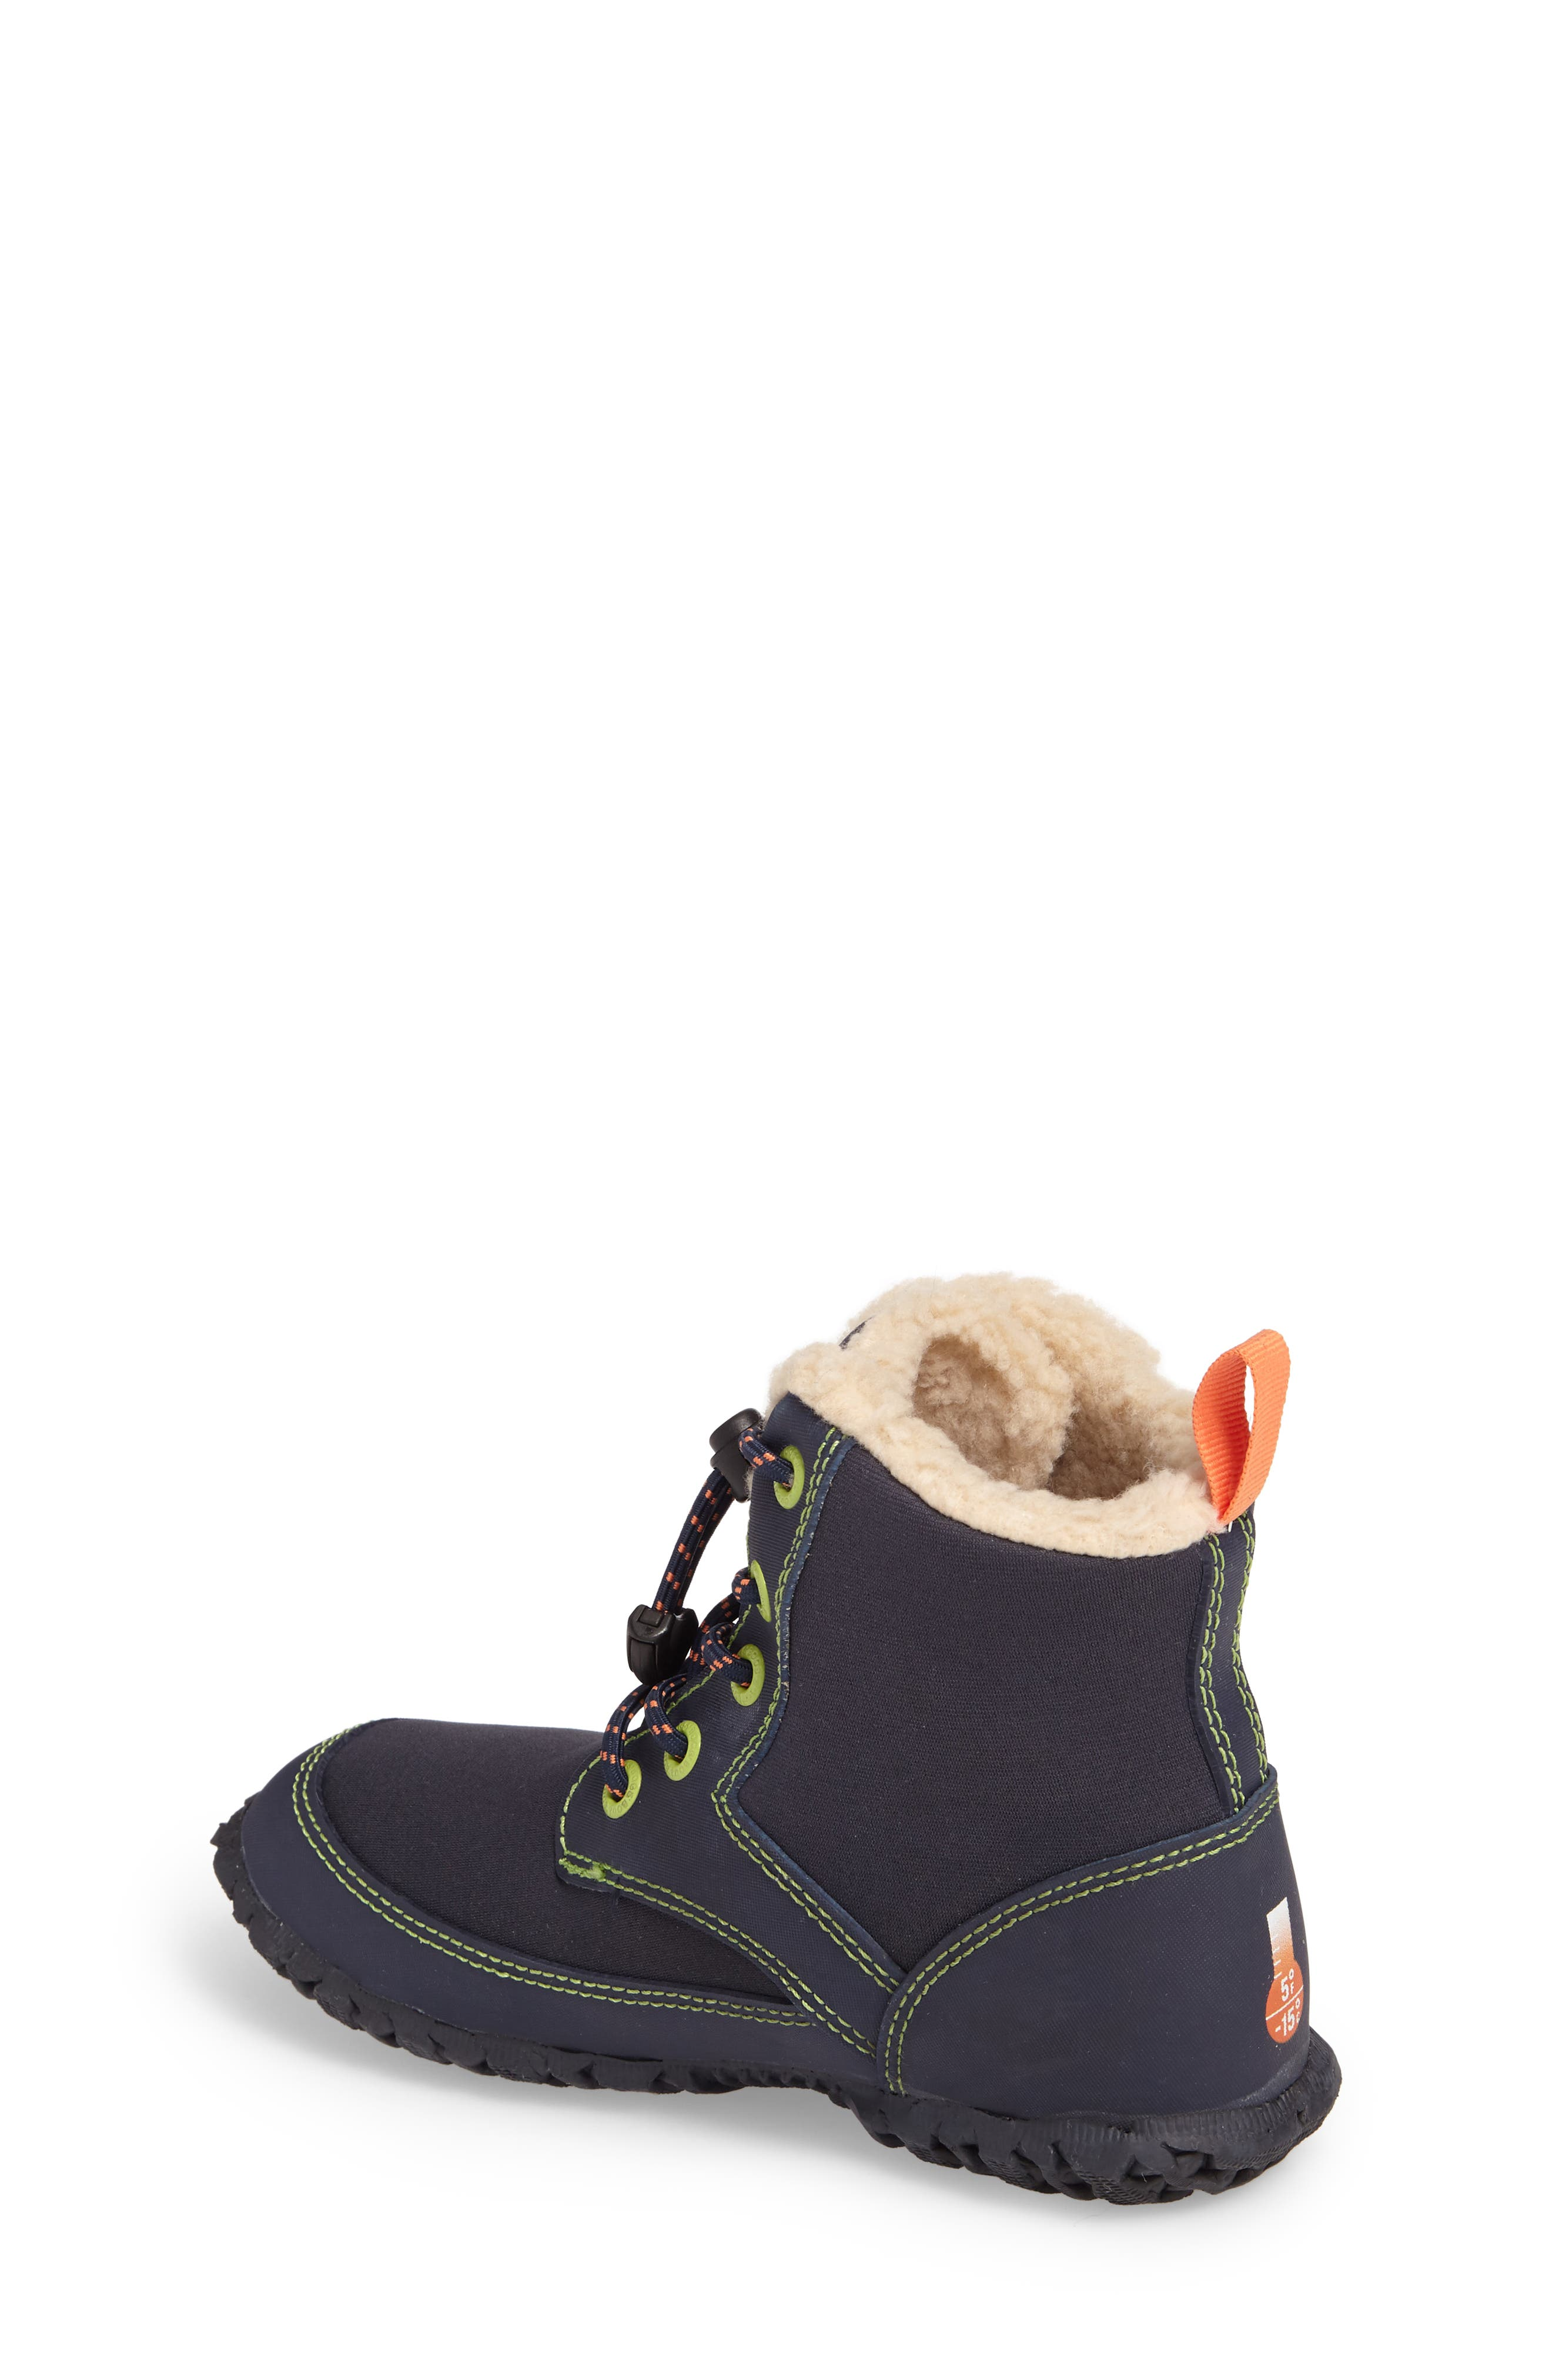 Skyler Faux Fur Insulated Waterproof Boot,                             Alternate thumbnail 2, color,                             Dark Blue Multi